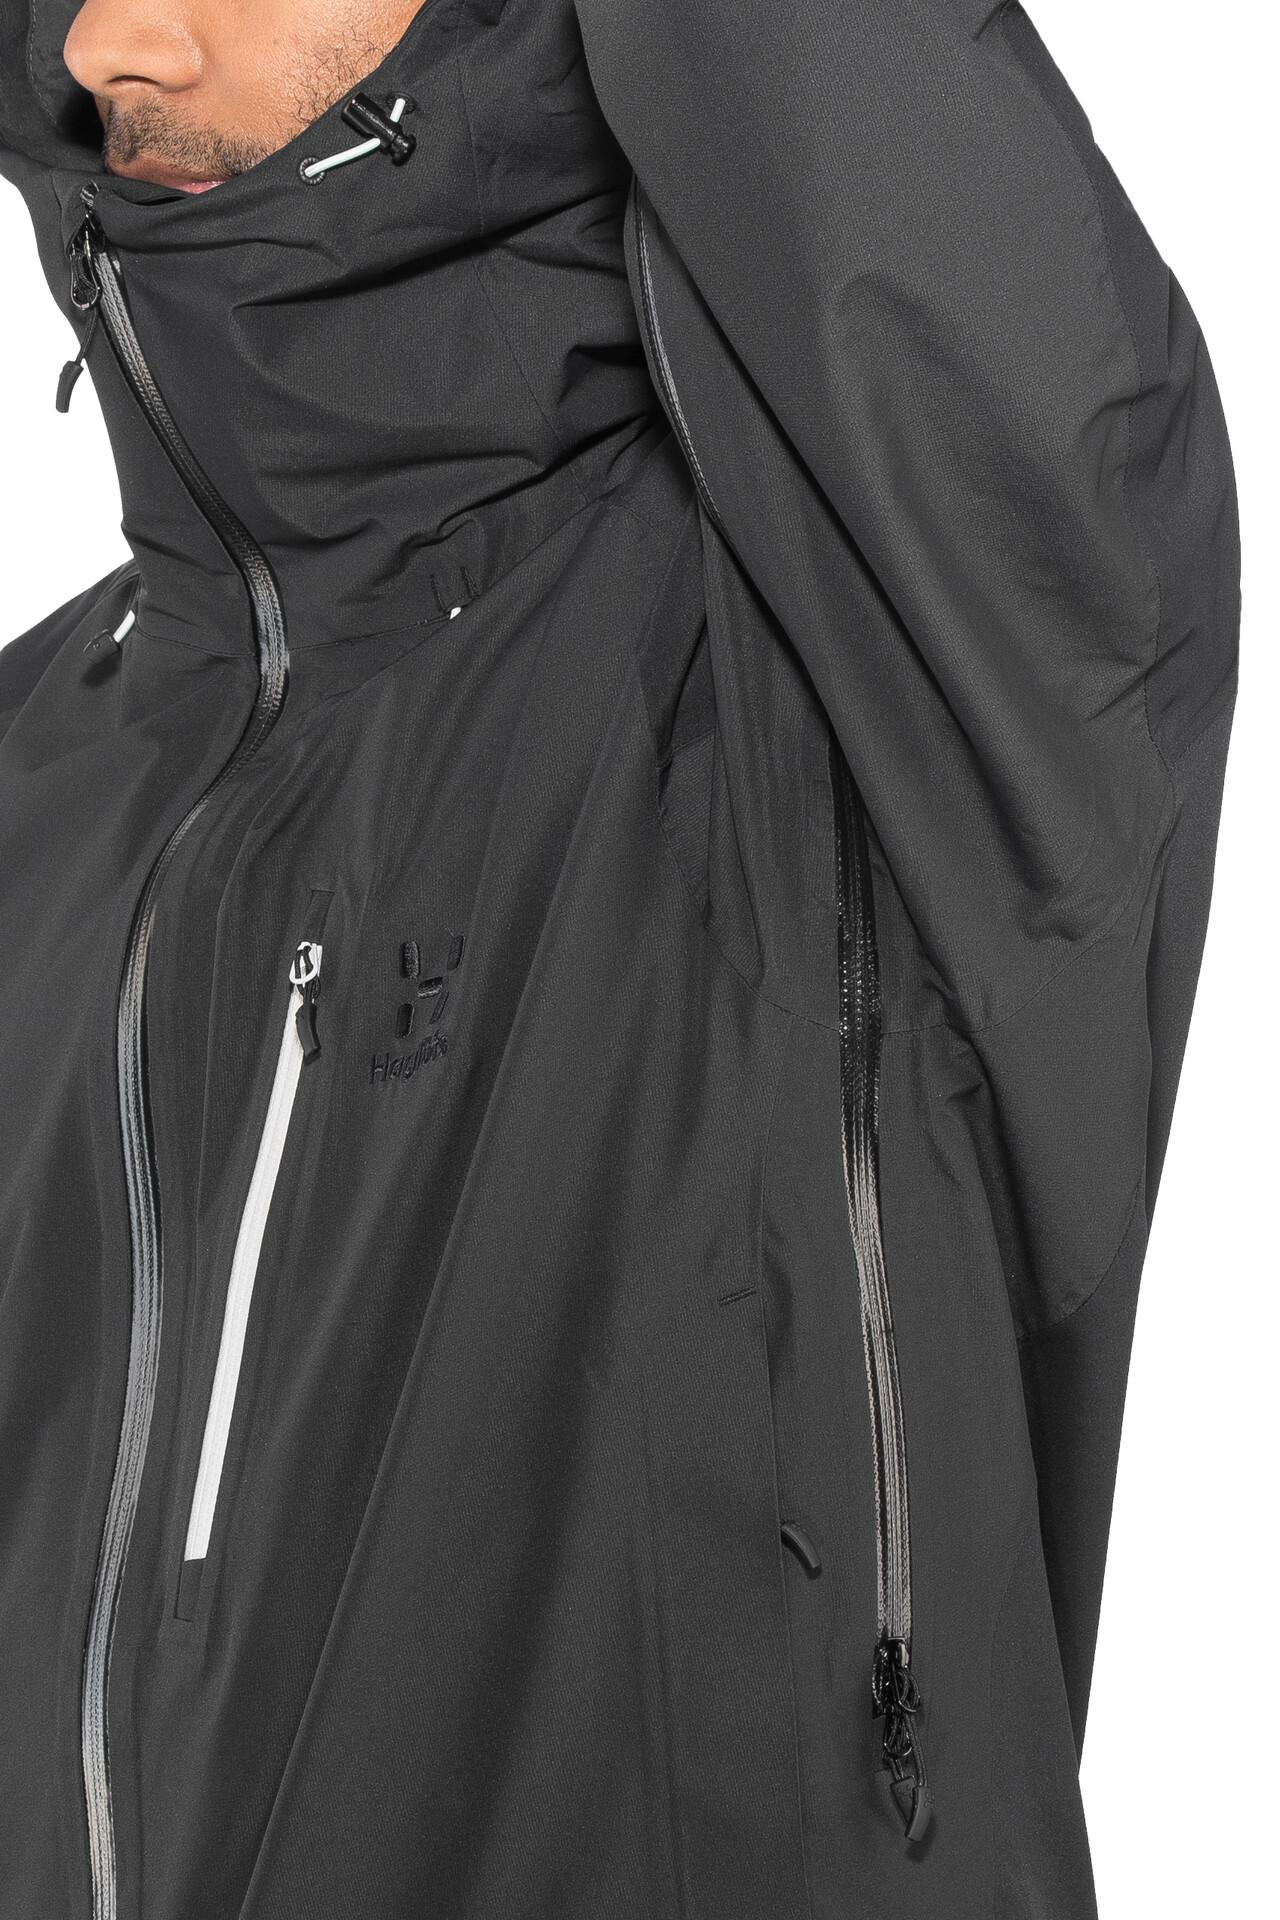 Black Jacket Haglöfs Herren Niva True VpqSzMU